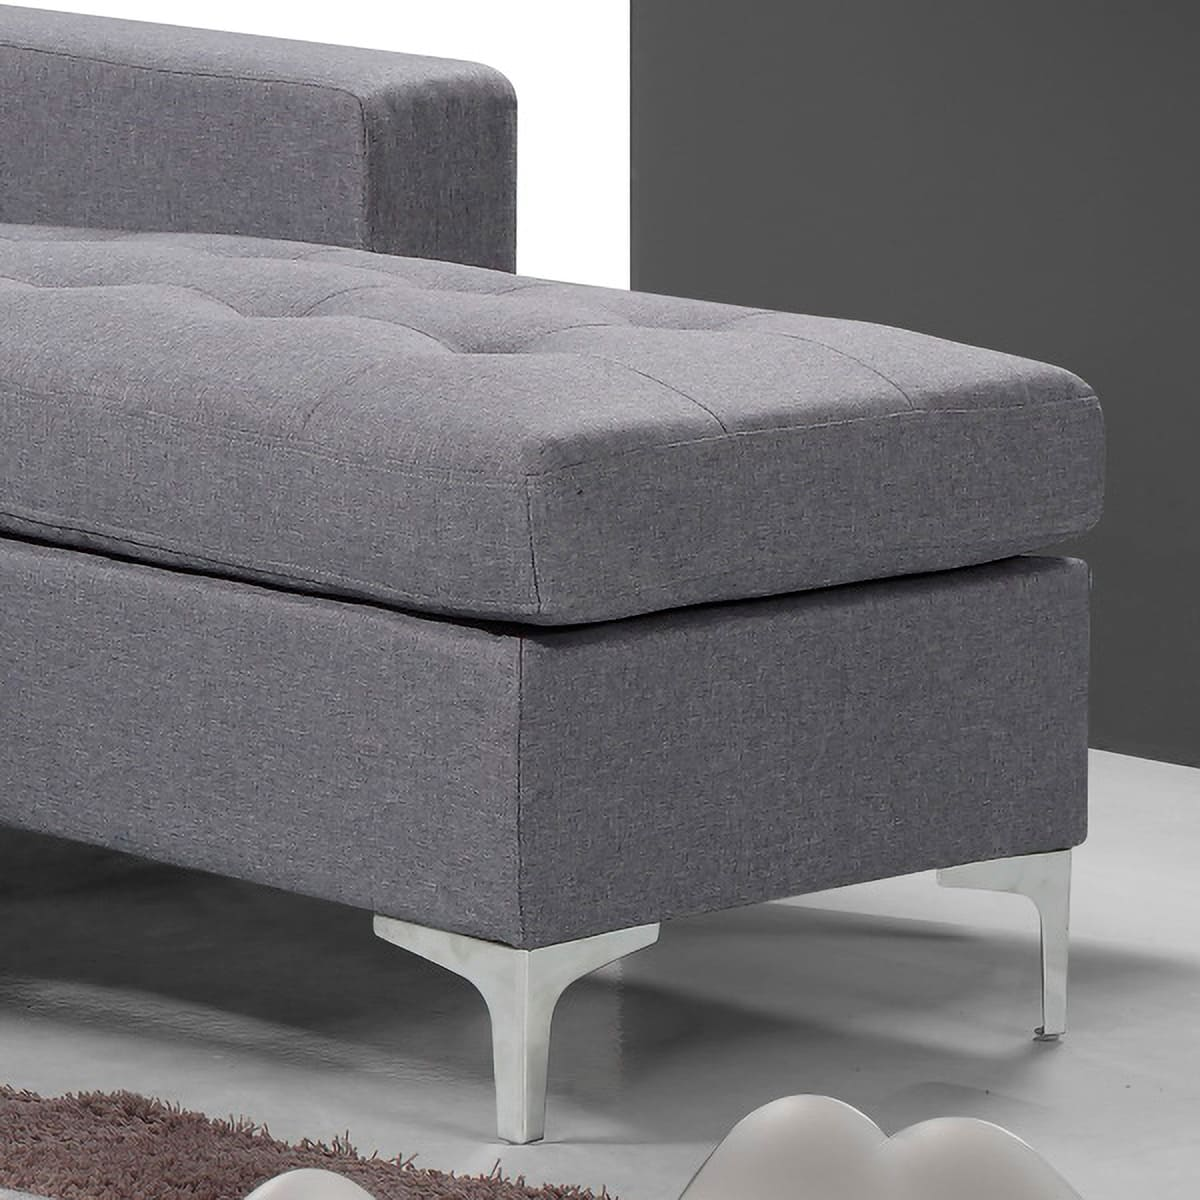 Sofá Chaiselongue 200CM tapizado gris Viana detalle del chaise y patas metálicas